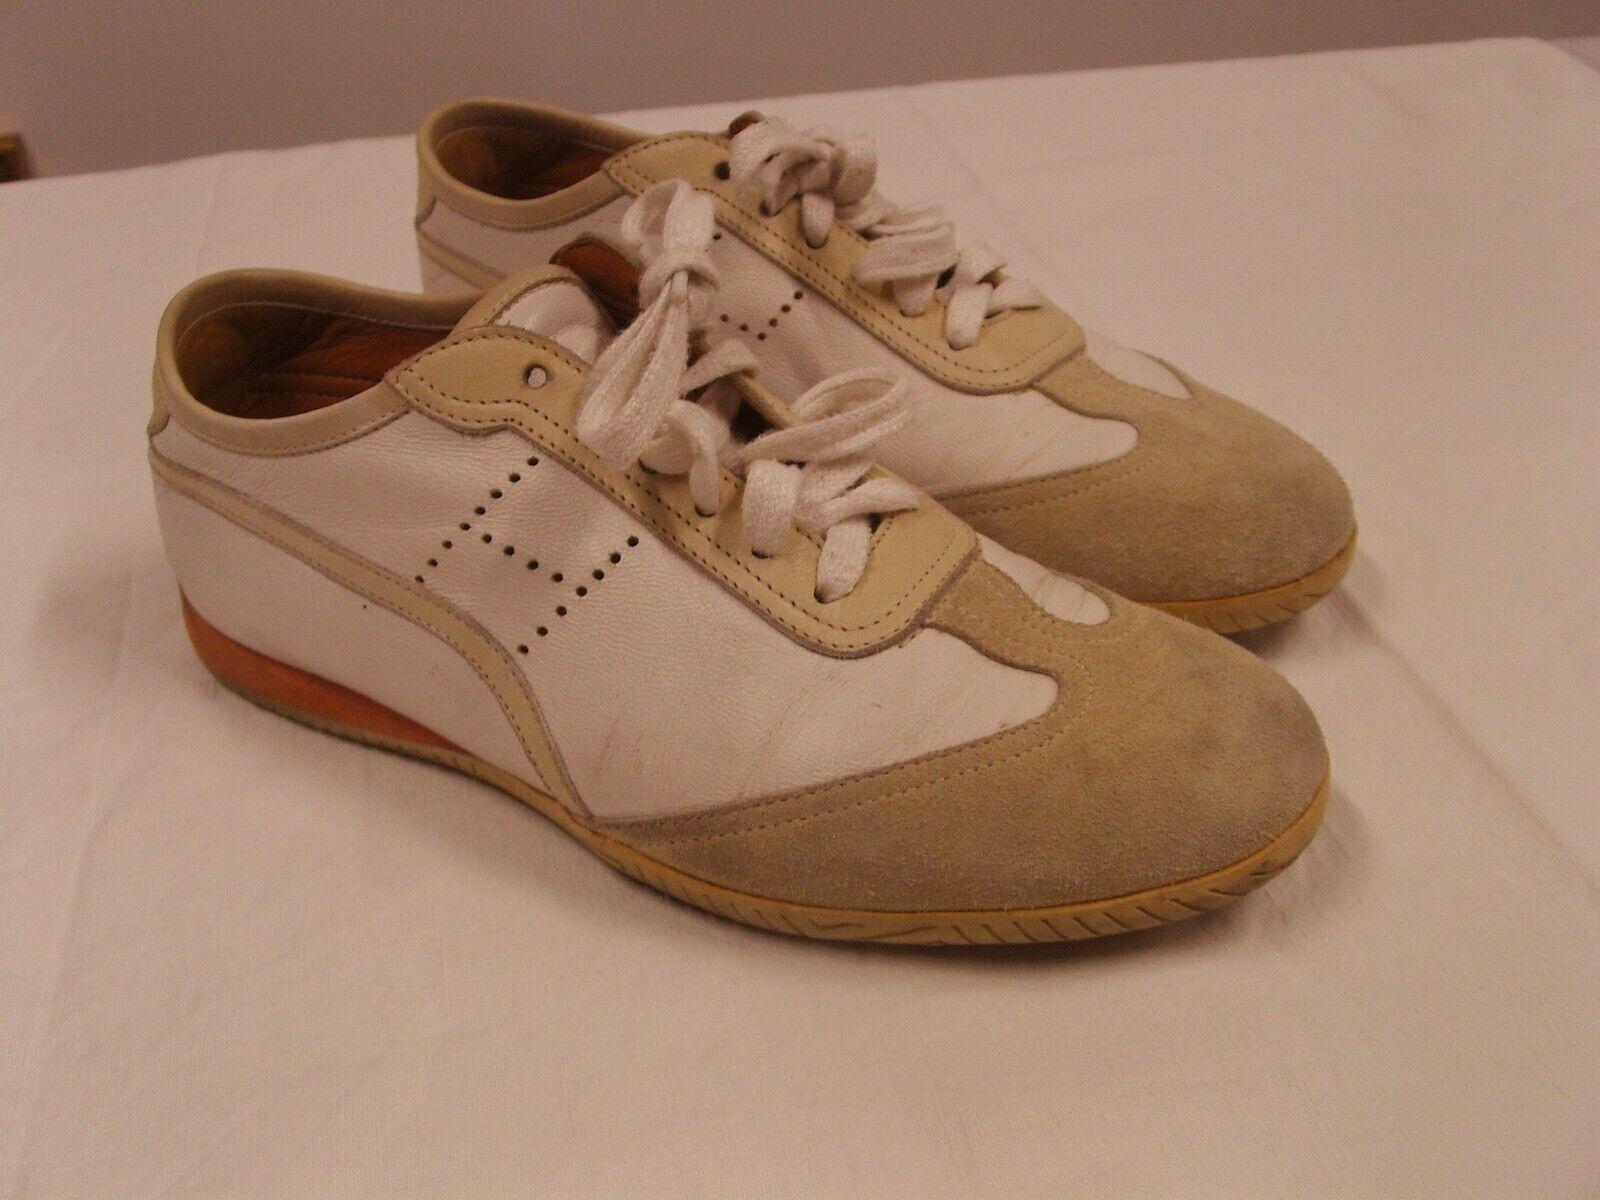 Sneakers / basket hermes t.39 avec boite